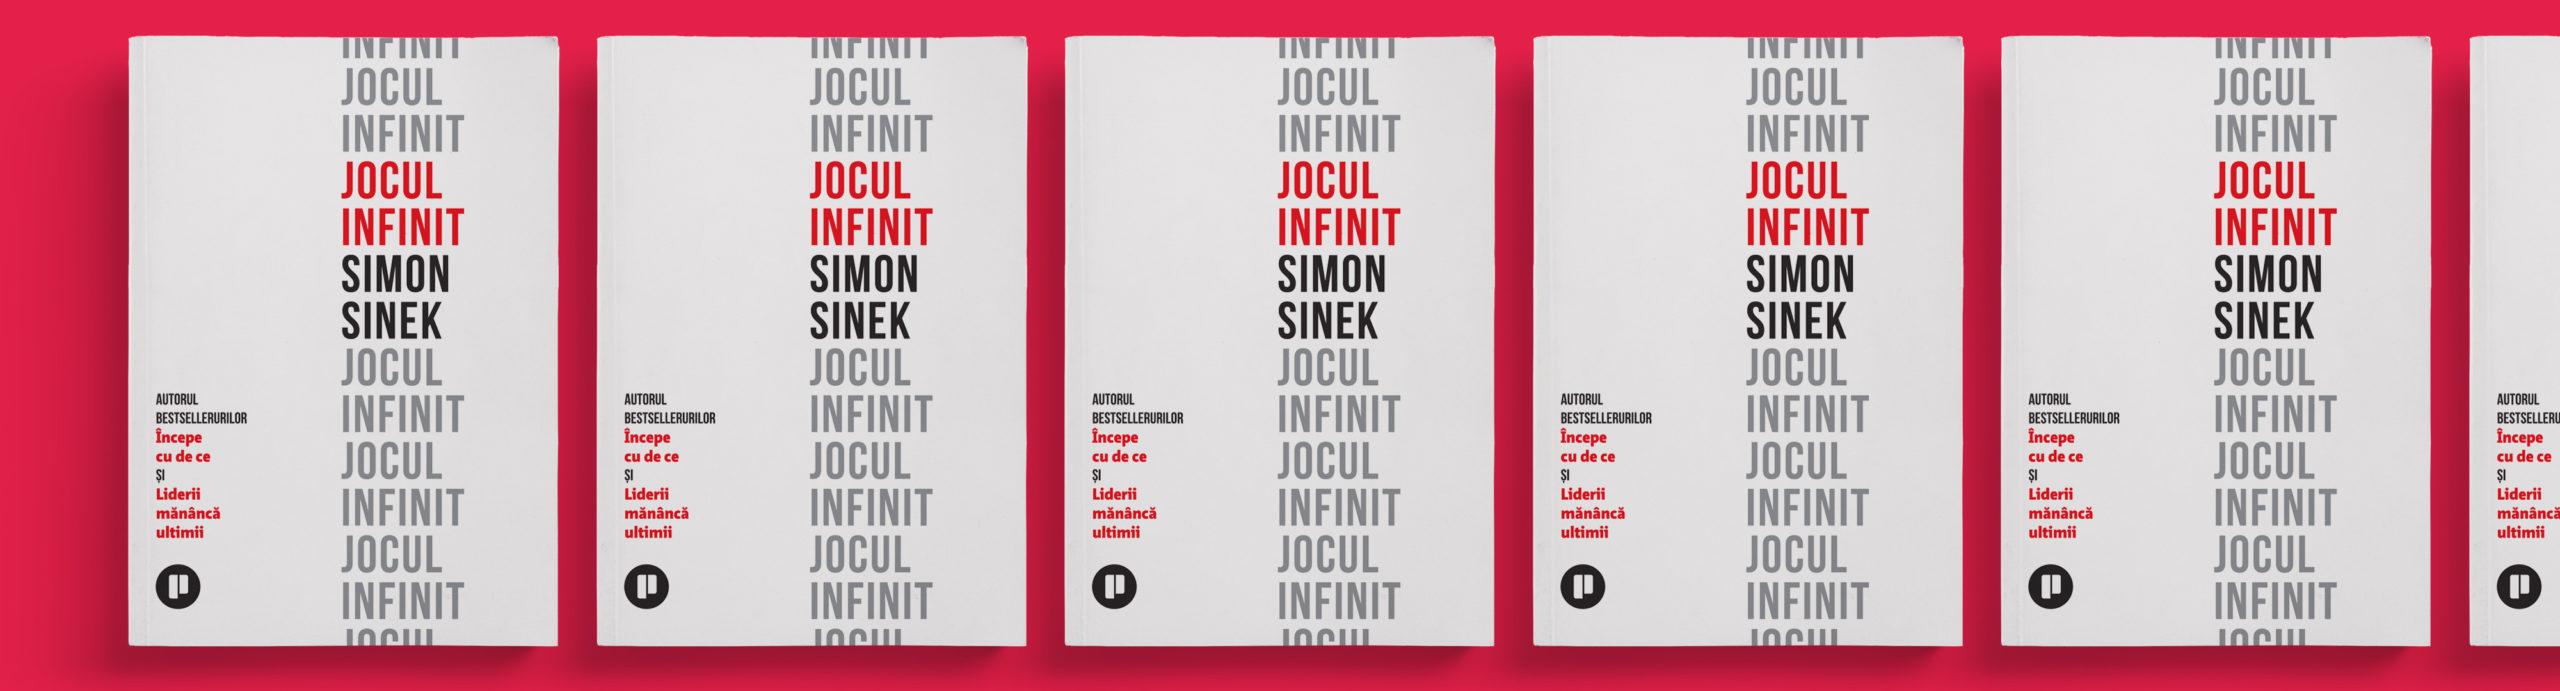 Simon Sinek despre jocul infinit